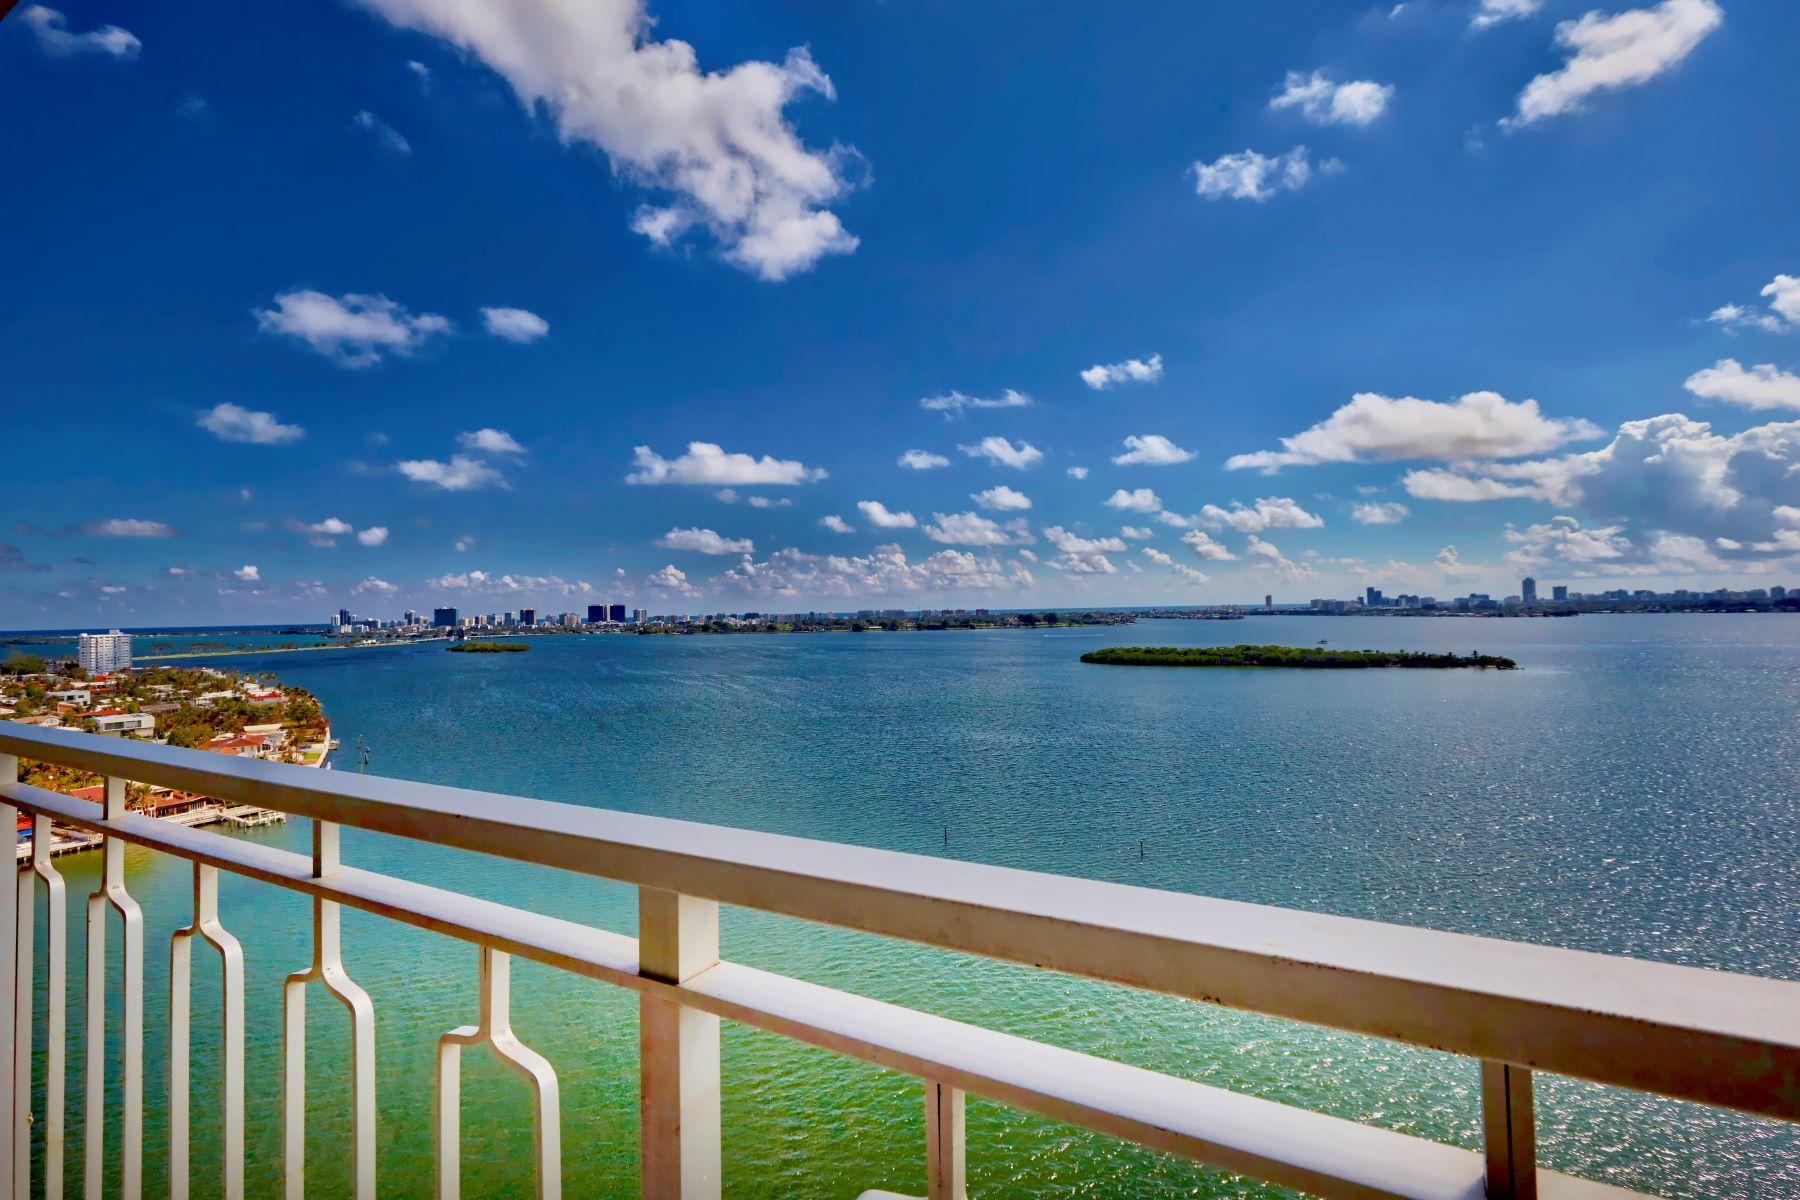 Condominium for Sale at 11111 Biscayne Blvd #20B 11111 Biscayne Blvd 20B, Miami, Florida, 33181 United States